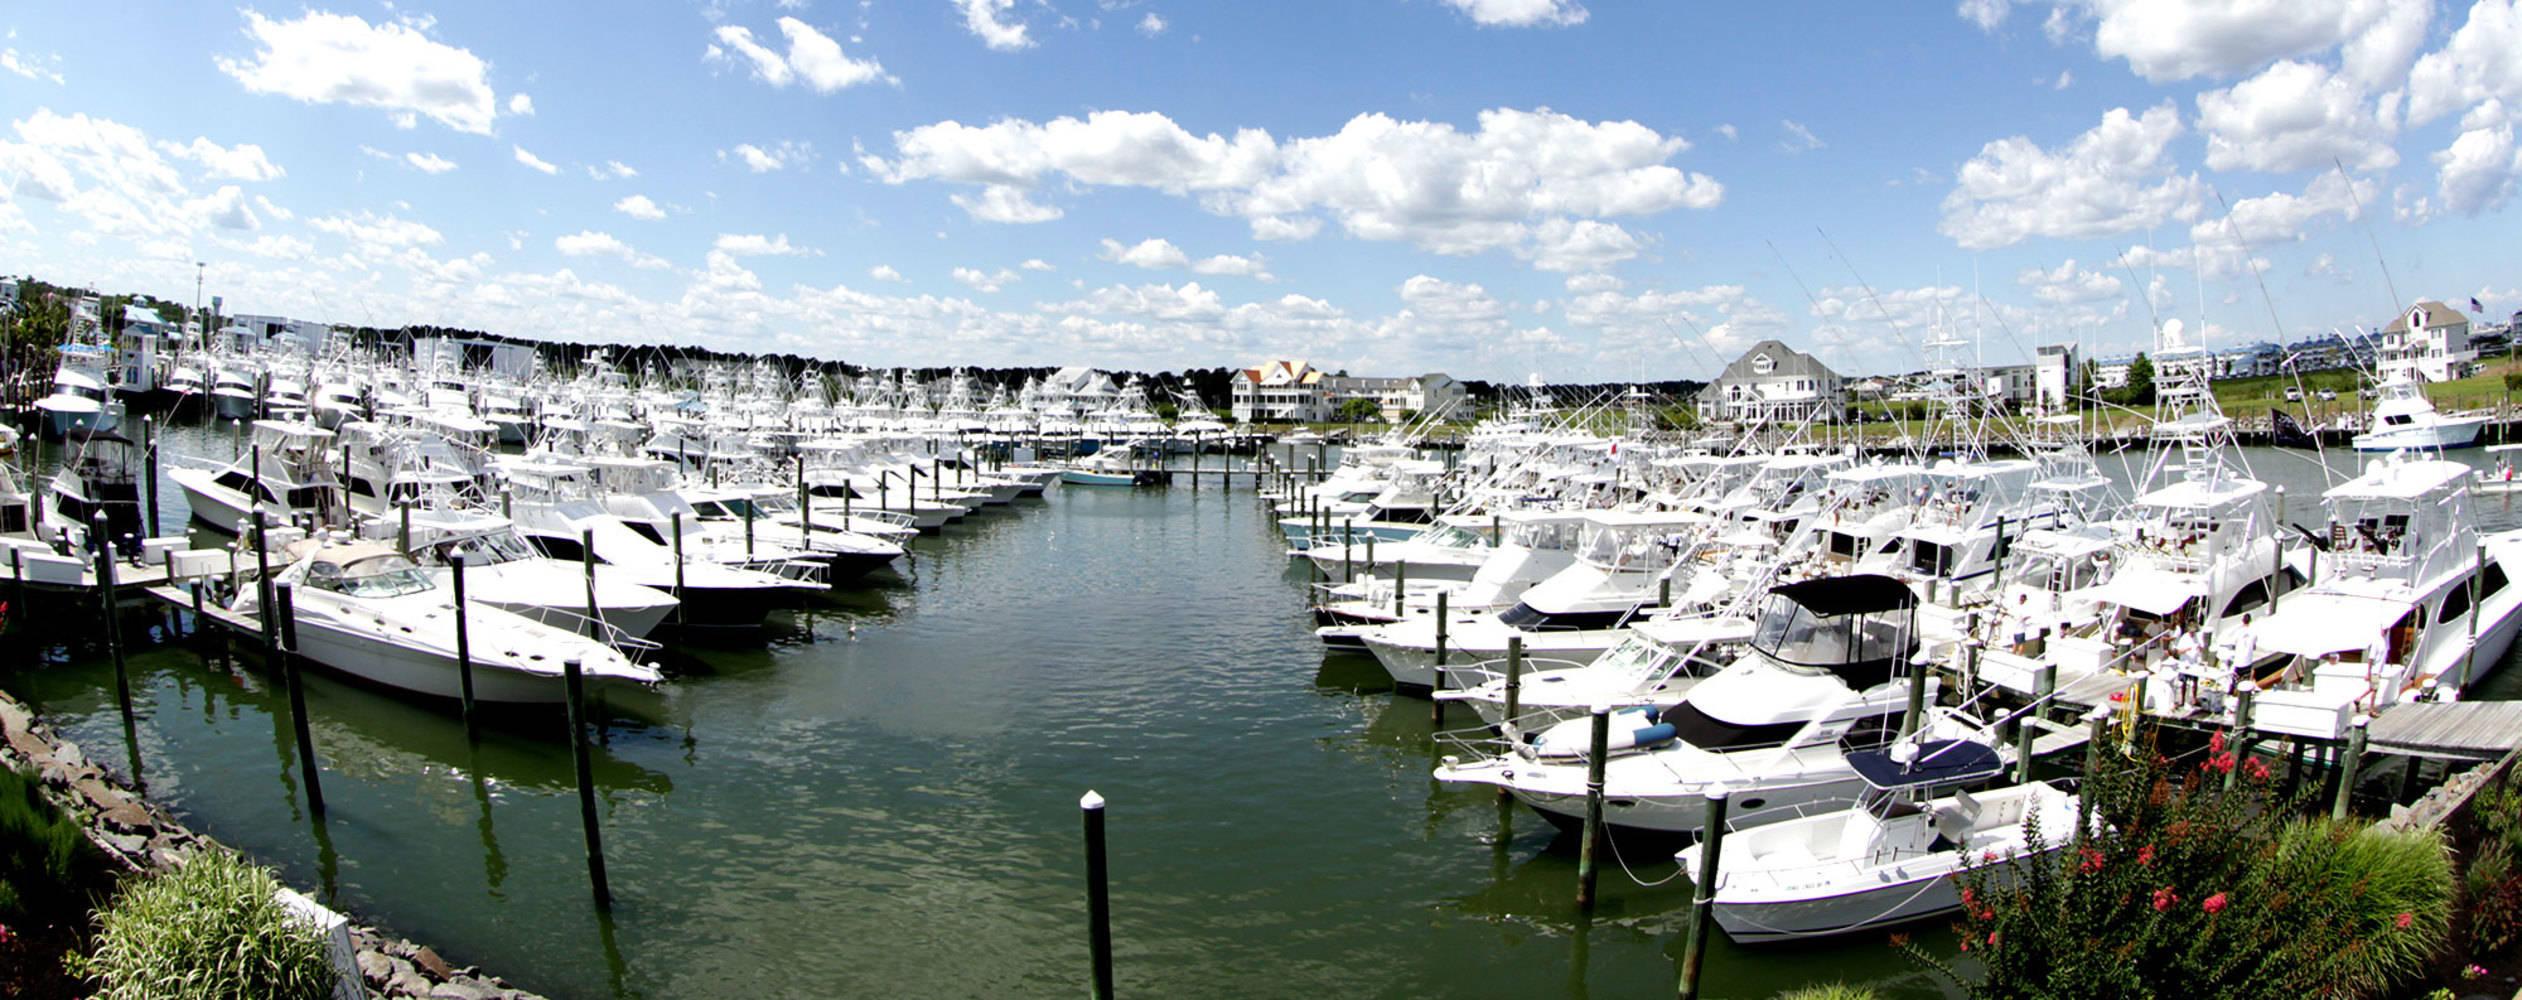 Sunset Marina slip, dock, mooring reservations - Dockwa